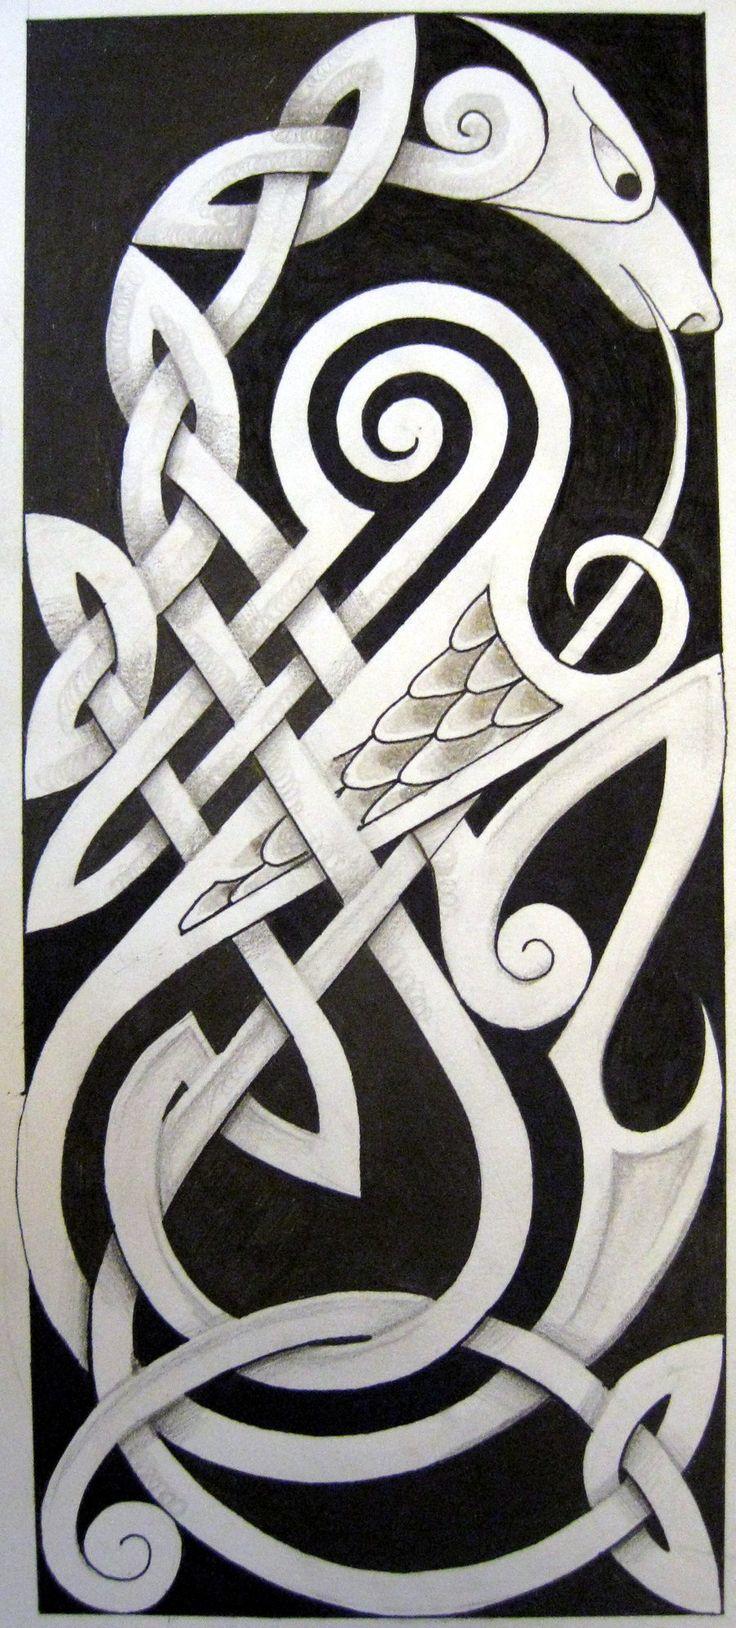 celtic2 by knotty-inks.deviantart.com on @deviantART